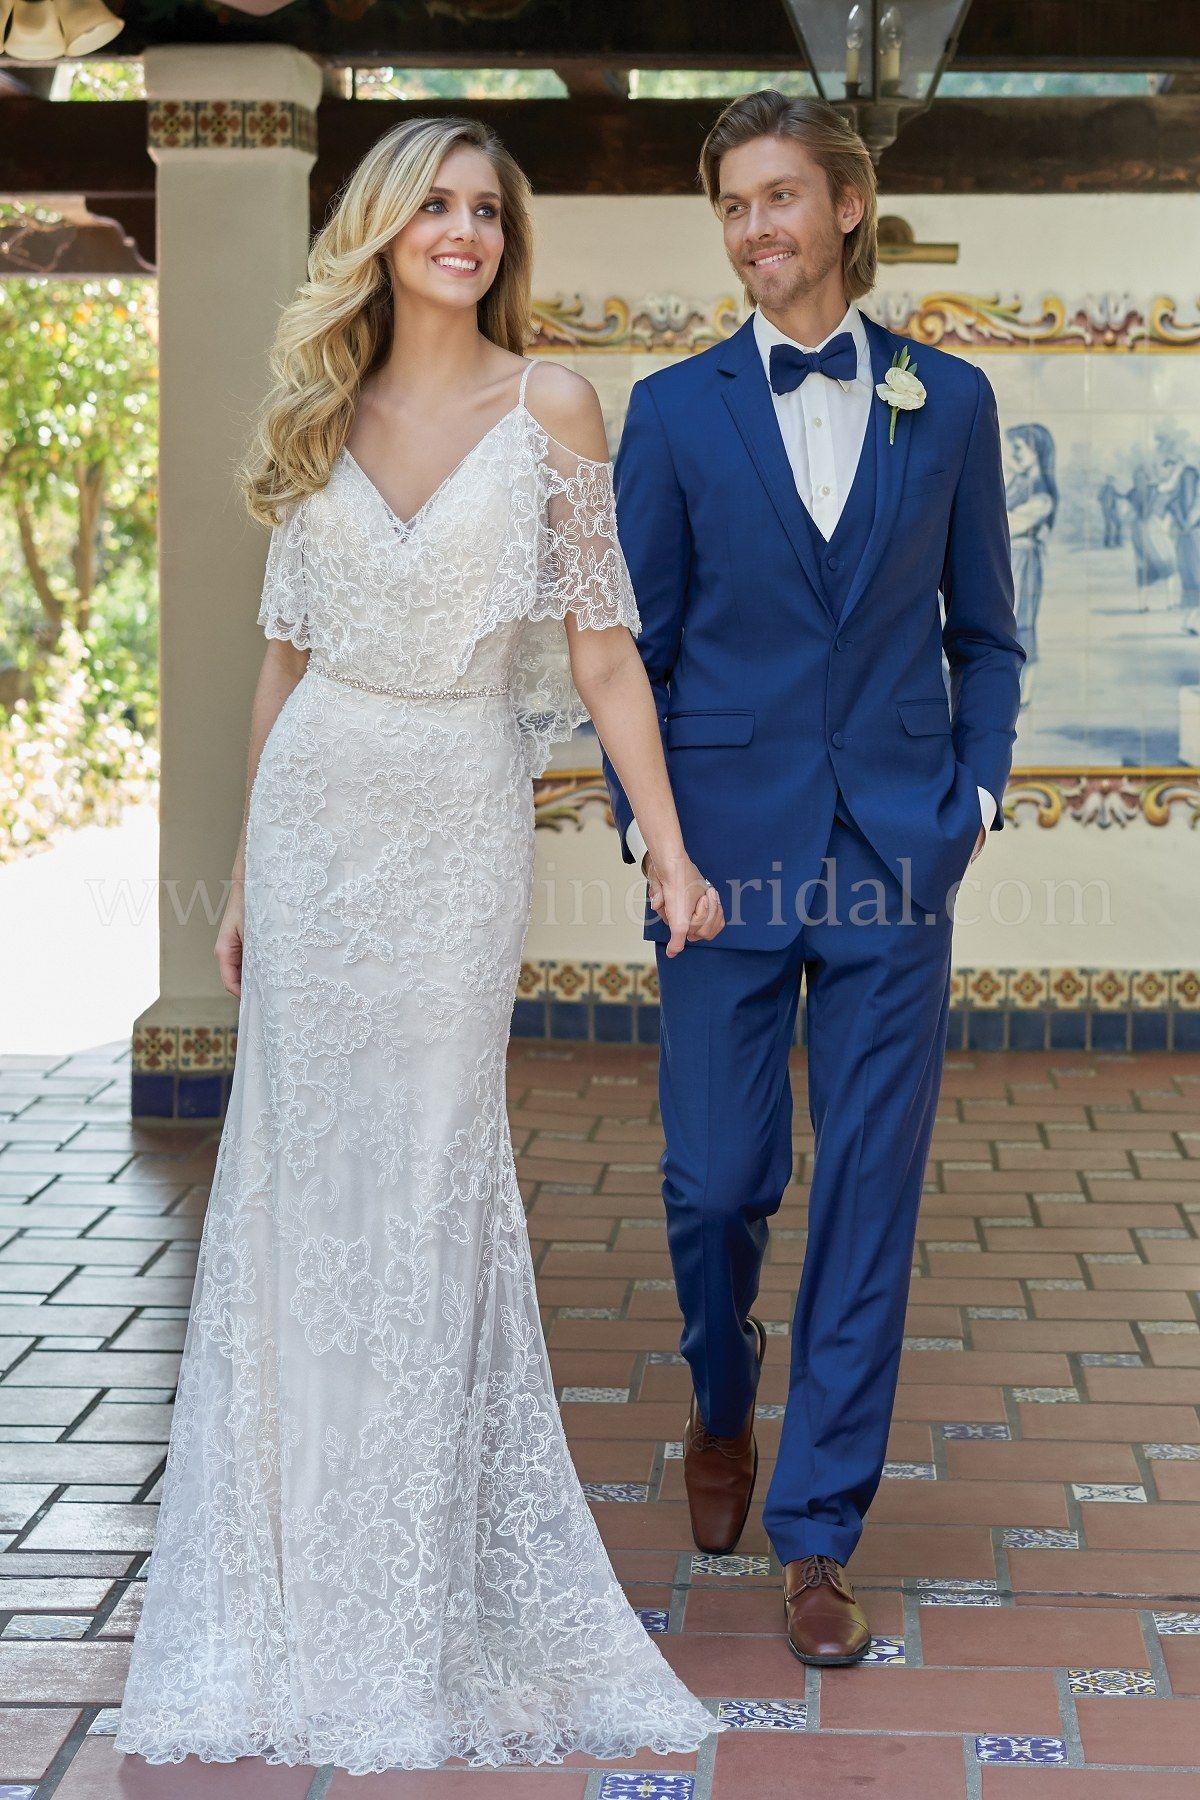 Jasmine wedding dresses  Jasmine Bridal Wedding Dress  Beautiful Wedding Dress  Pretty